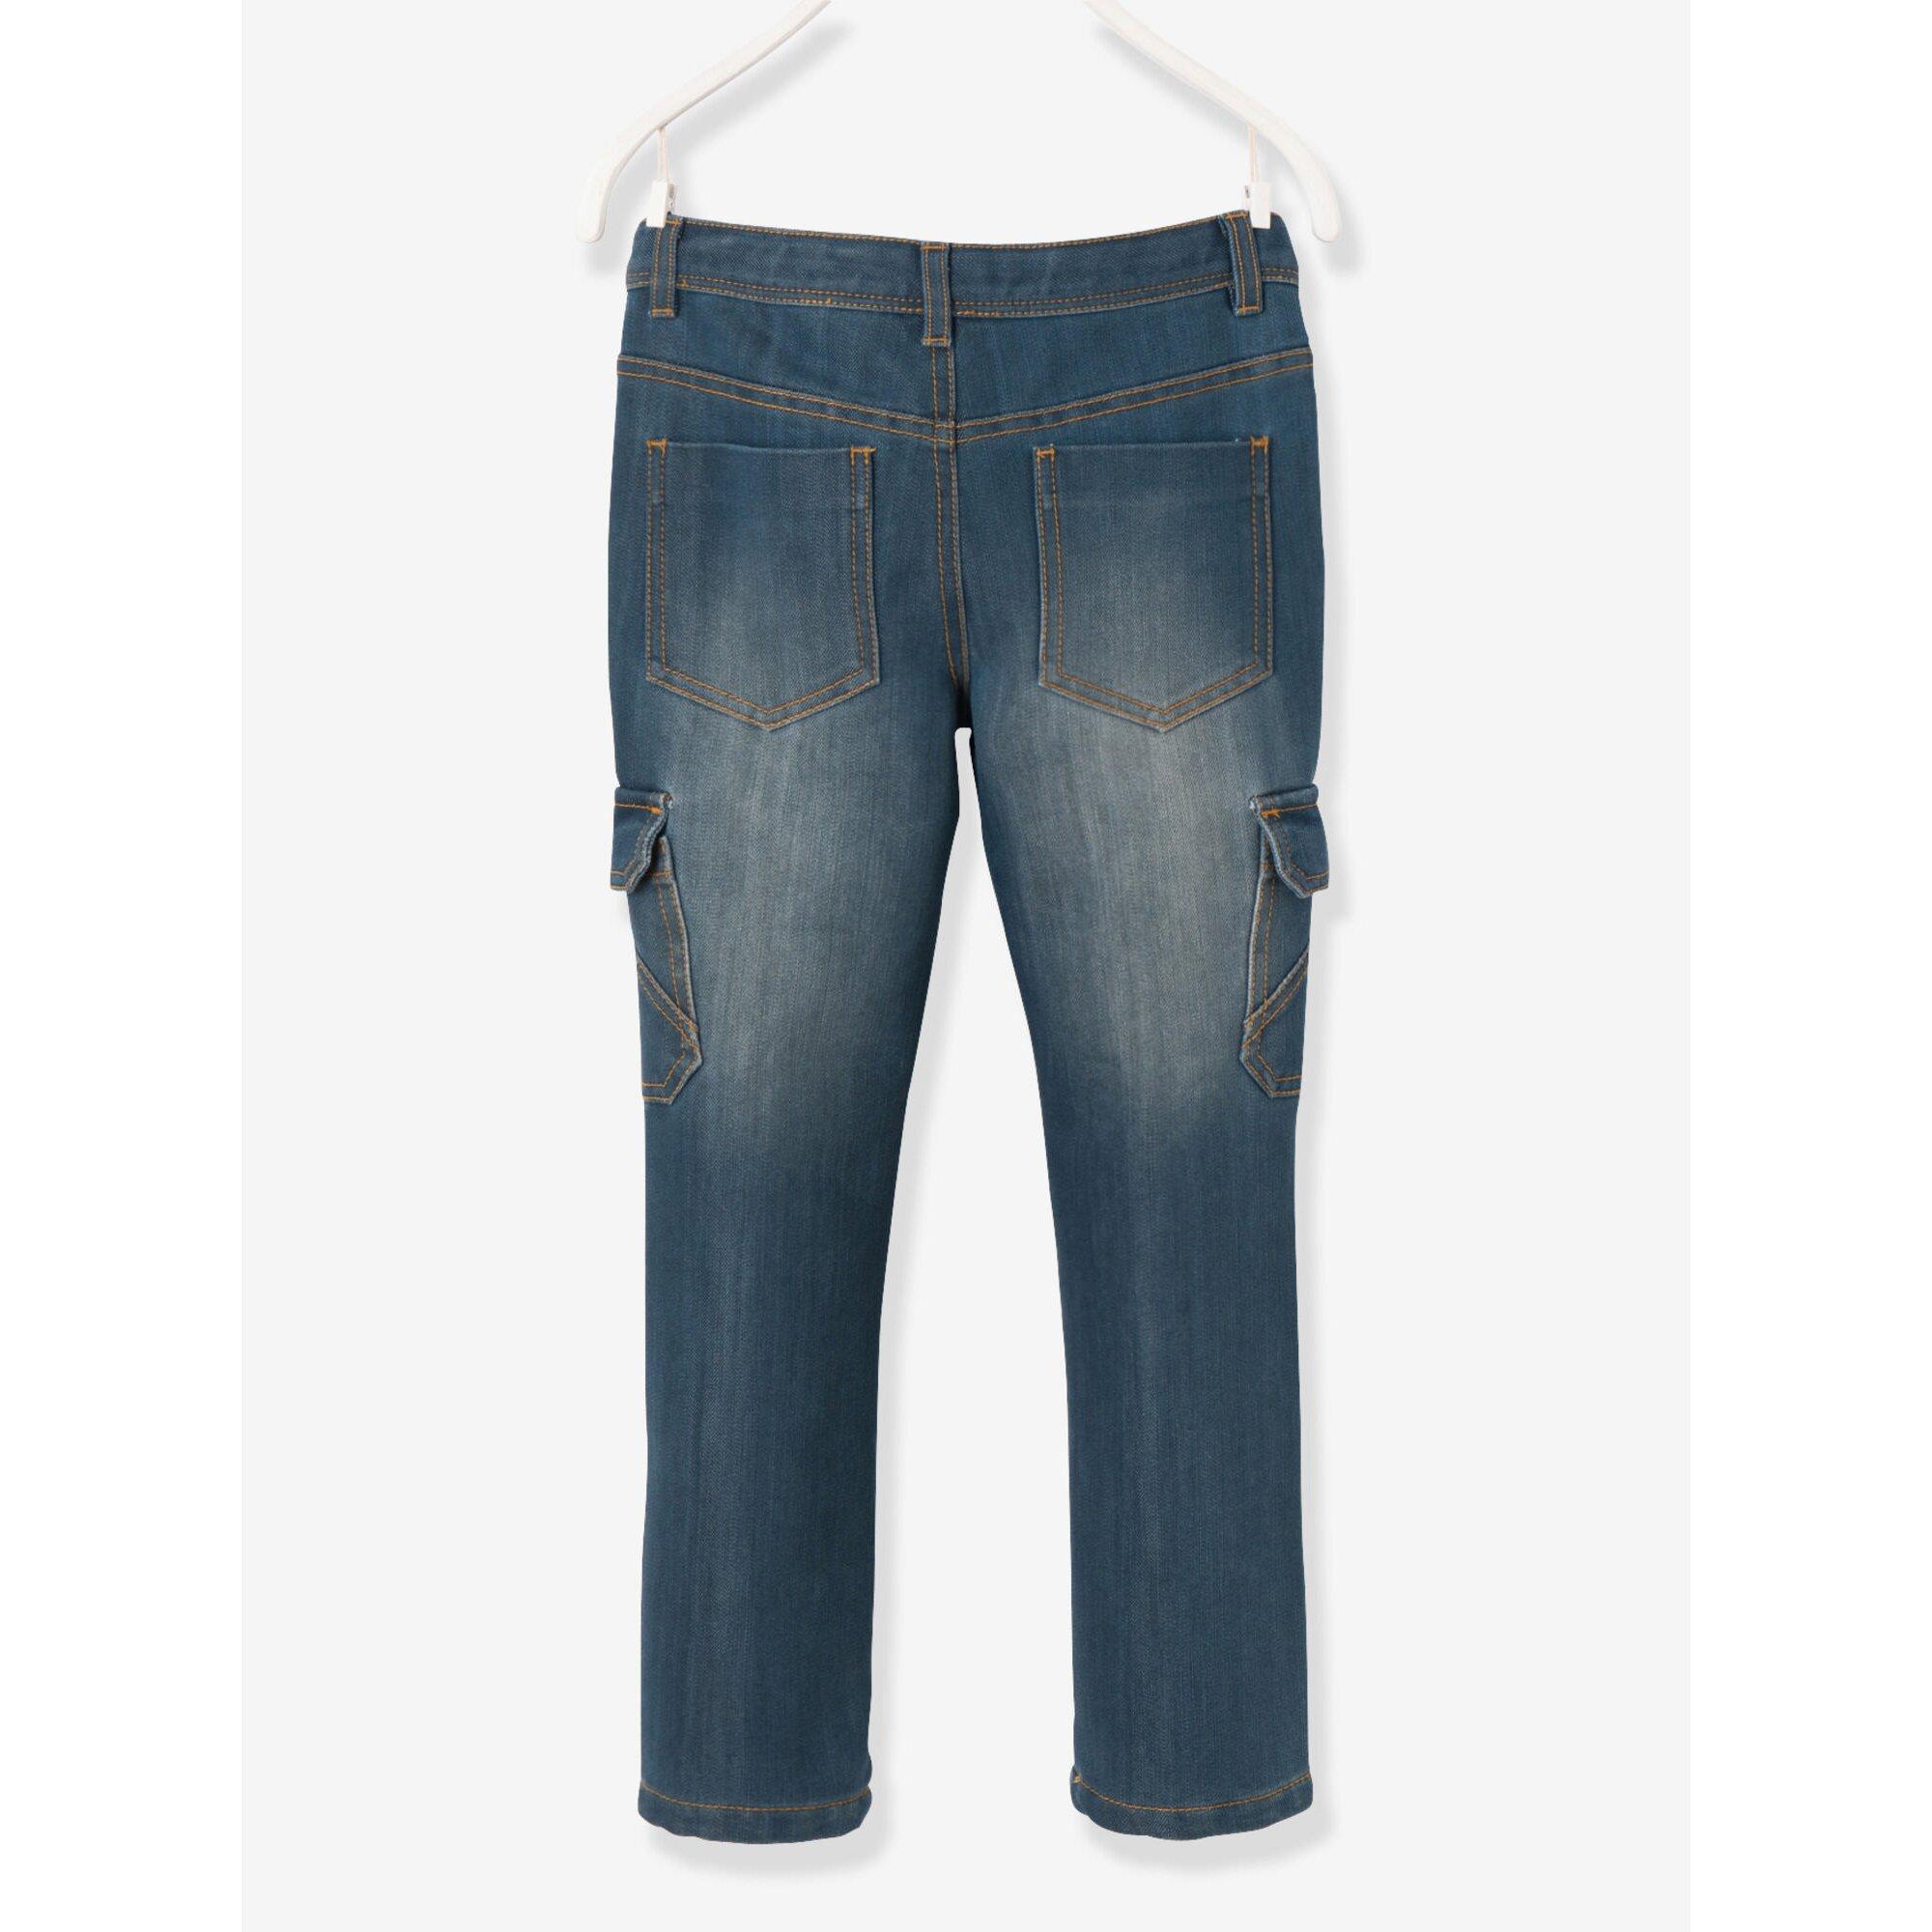 vertbaudet-robuste-thermo-jeans-fur-jungen-gerade, 30.99 EUR @ babywalz-de